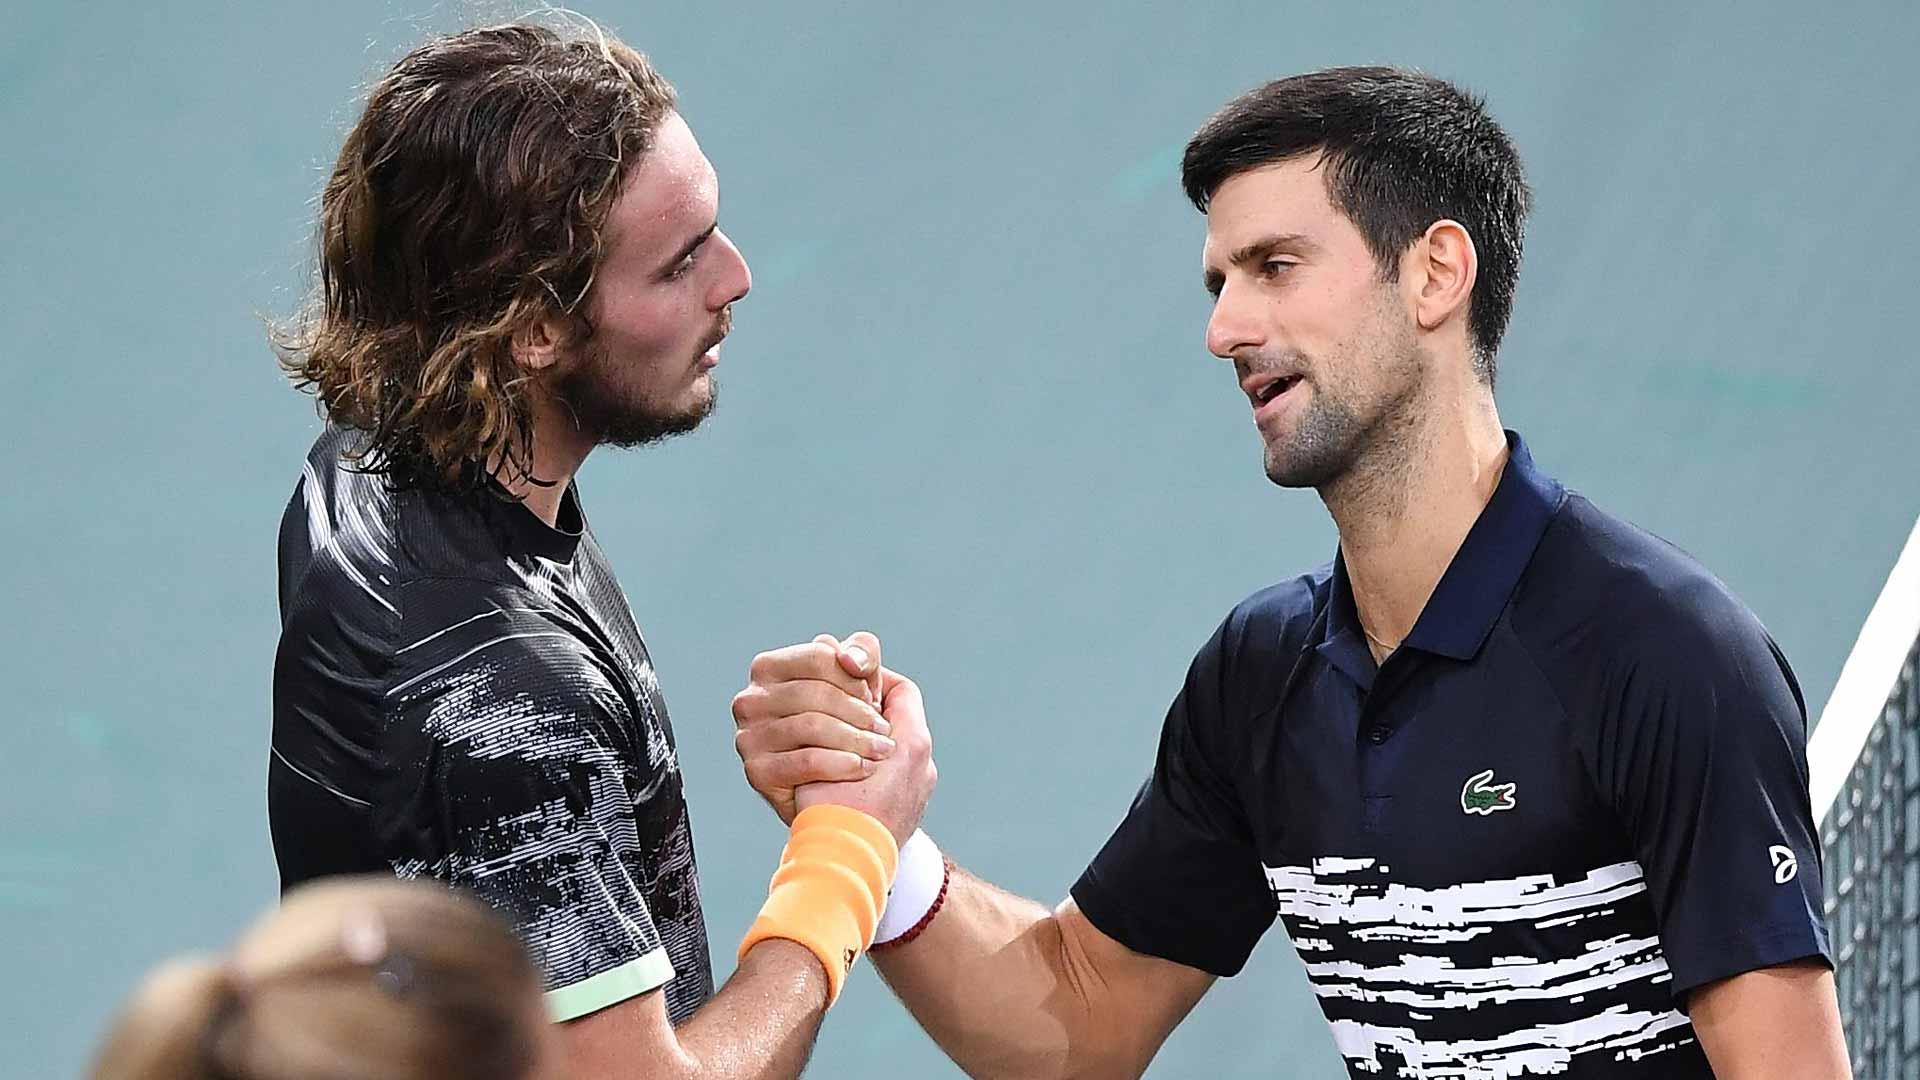 Blockbuster Dubai Final Novak Djokovic Stefanos Tsitsipas Add Chapter To Budding Rivalry Atp Tour The Union Journal